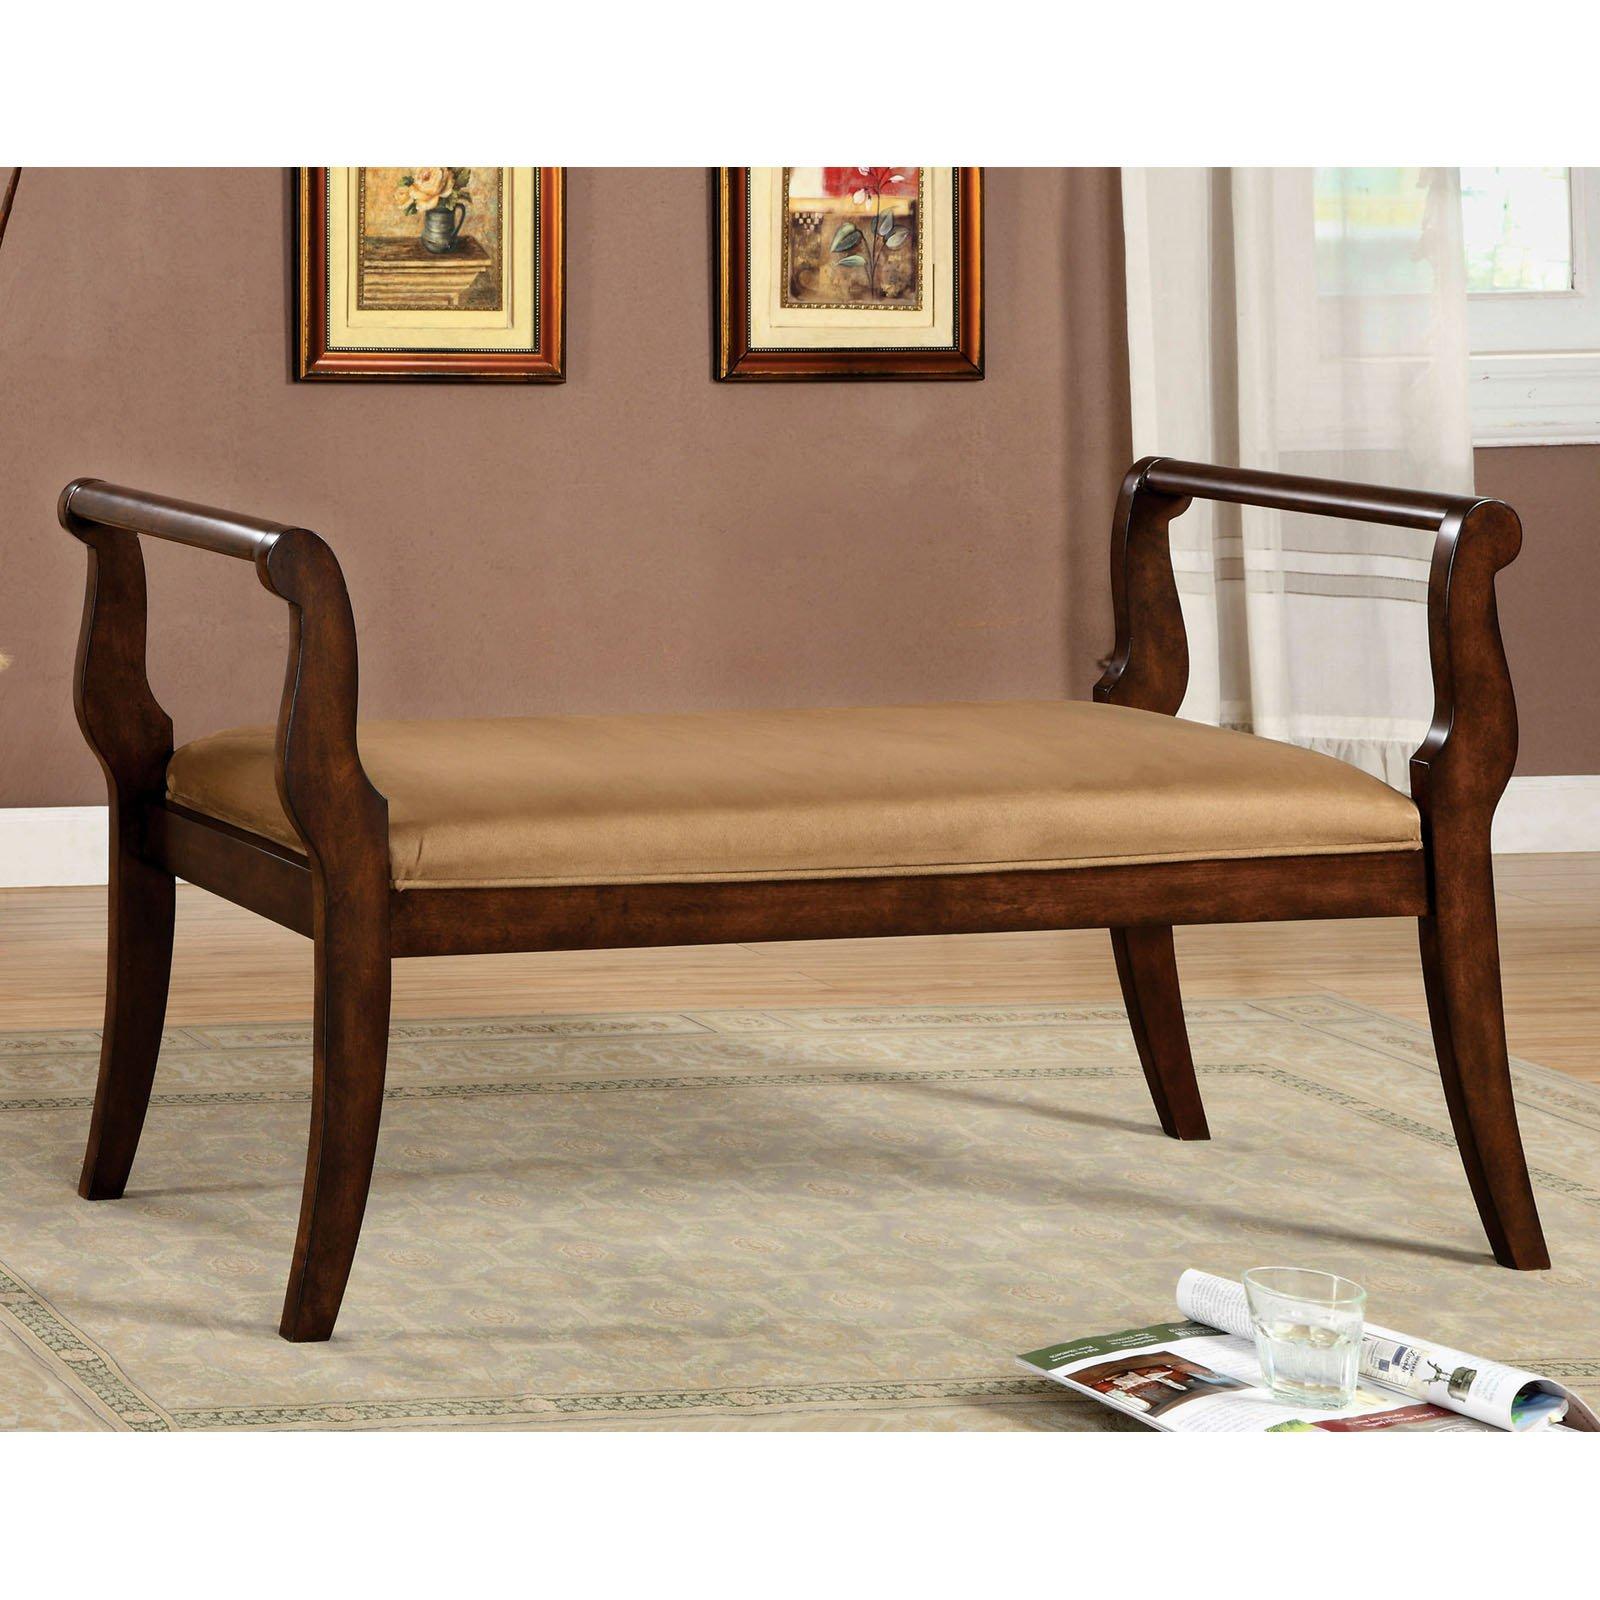 Furniture of America Pierre Velvet Upholstered Bench Seating